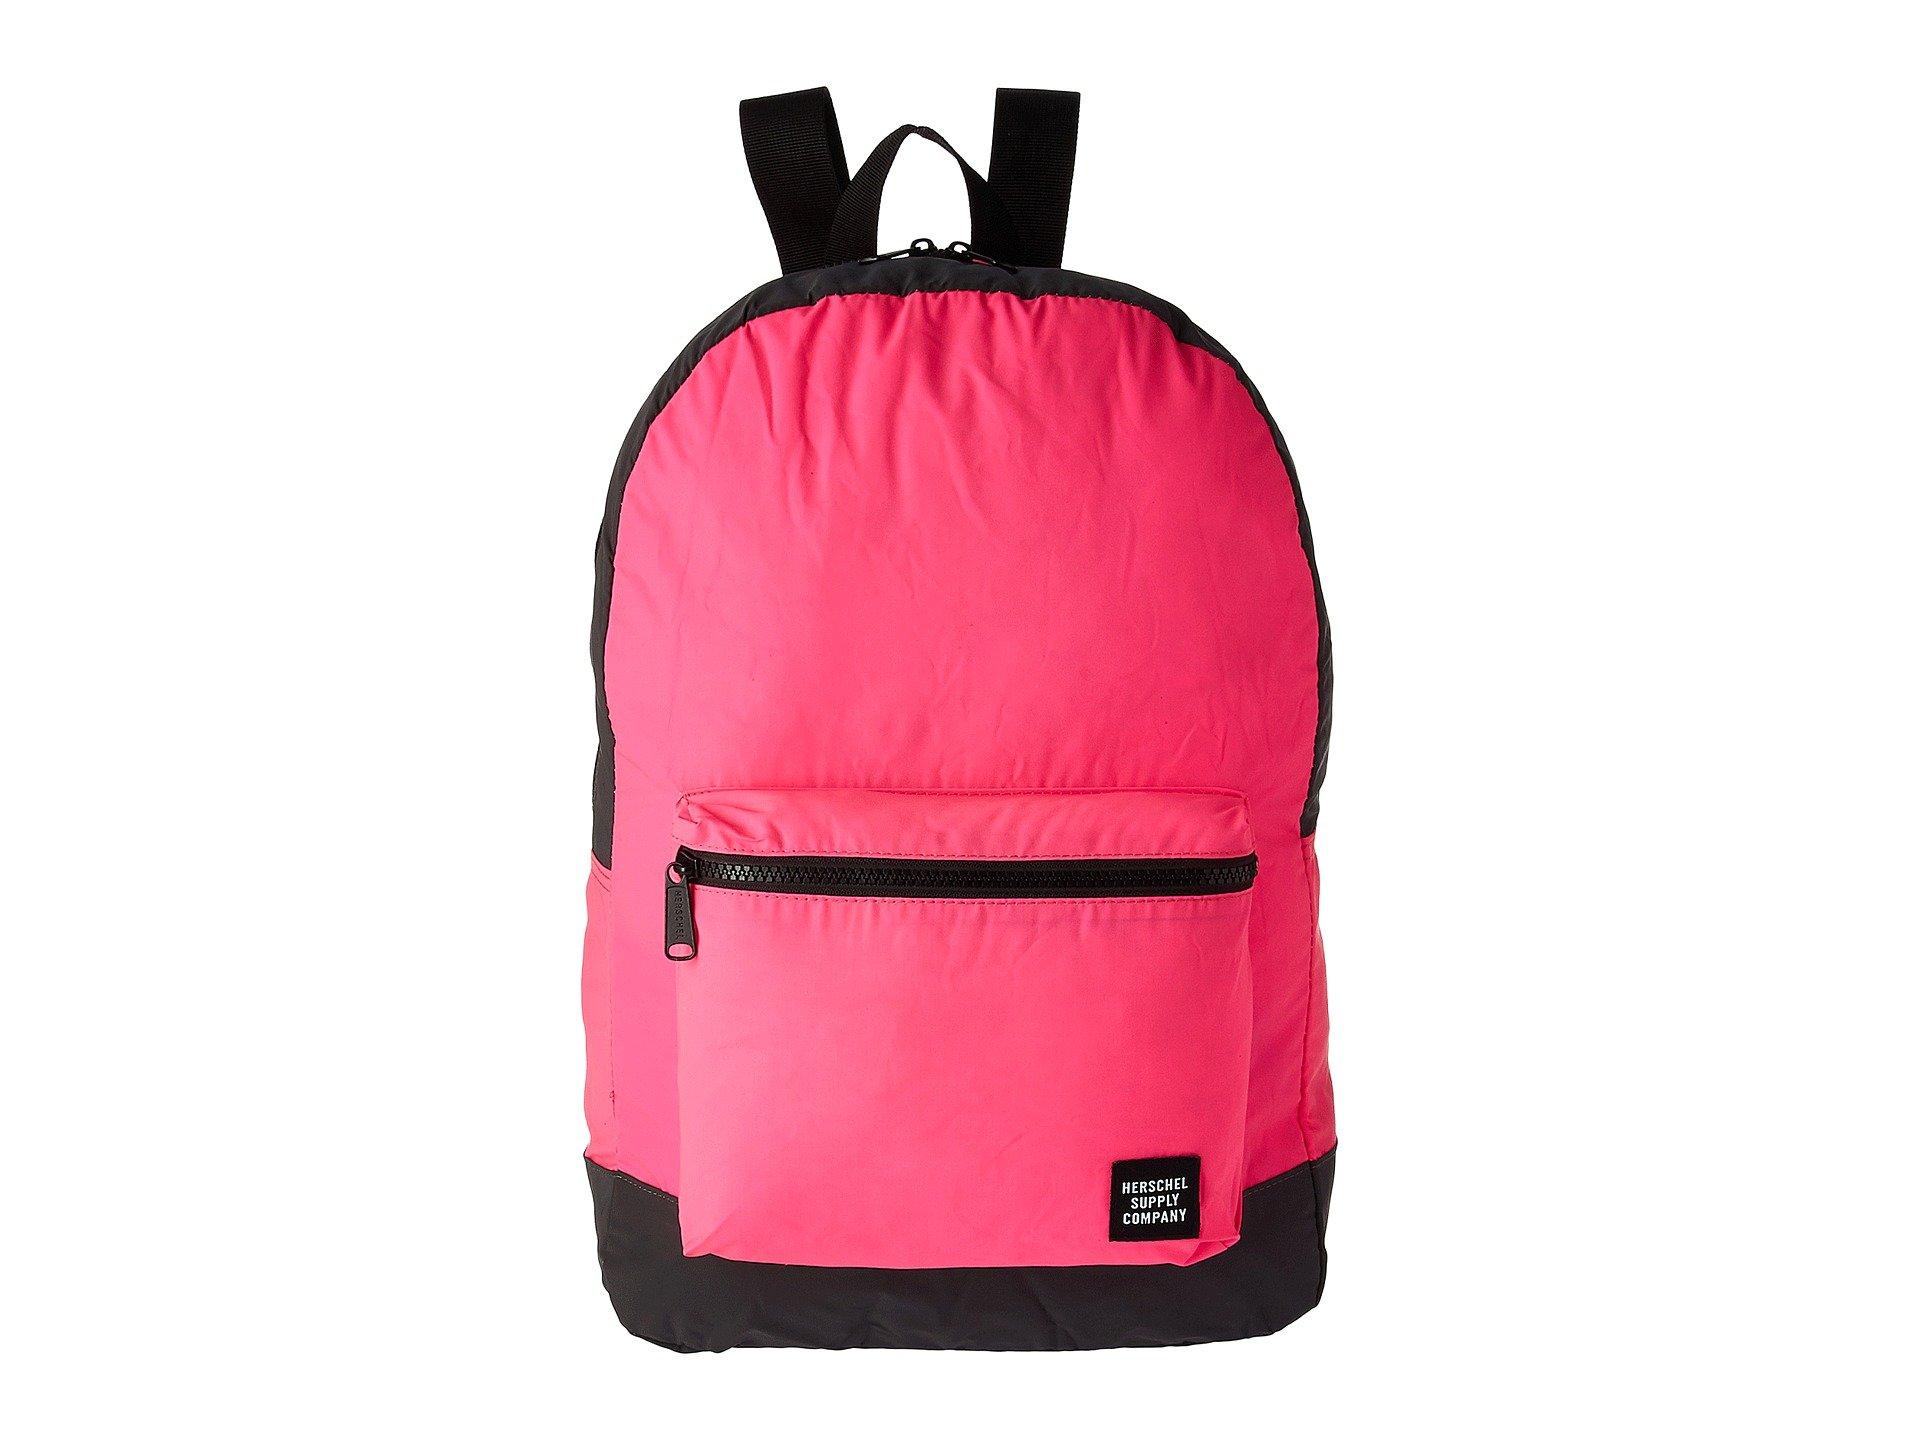 c6fe36bf15 Herschel Supply Co. Packable Daypack In Neon Pink Reflective Black  Reflective